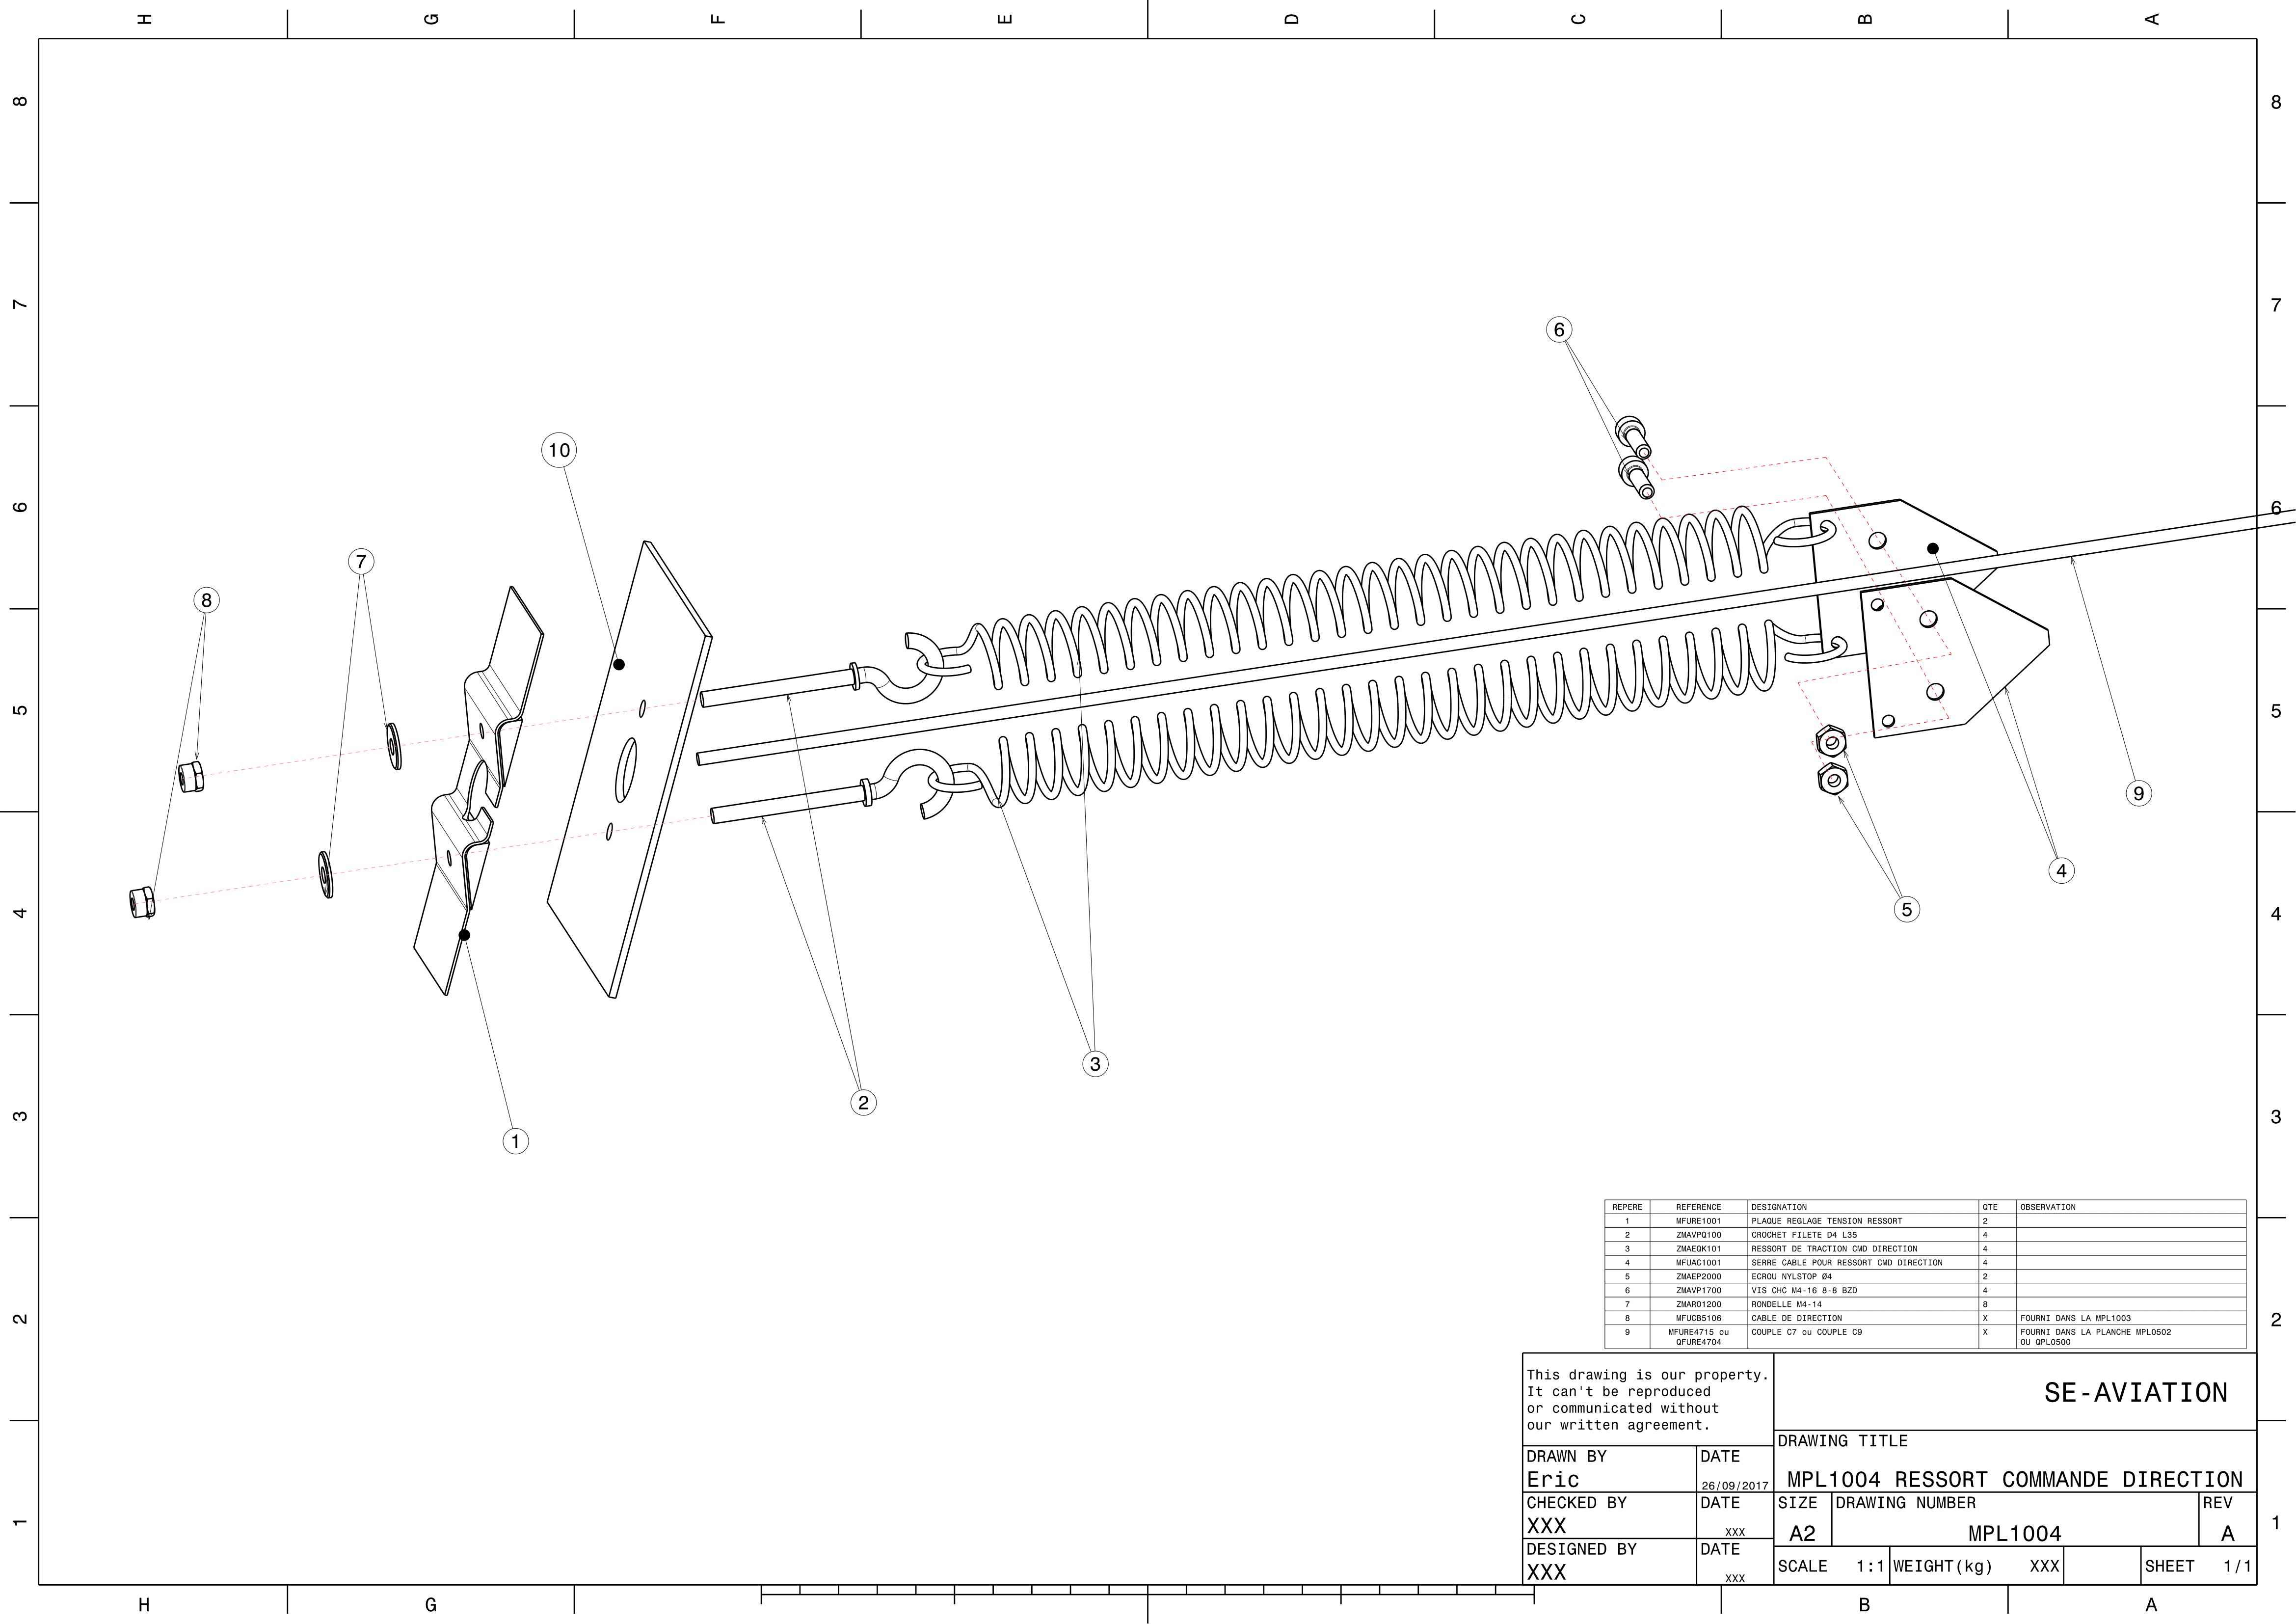 MPL1004 - RESSORT COMMANDE DIRECTION 4S